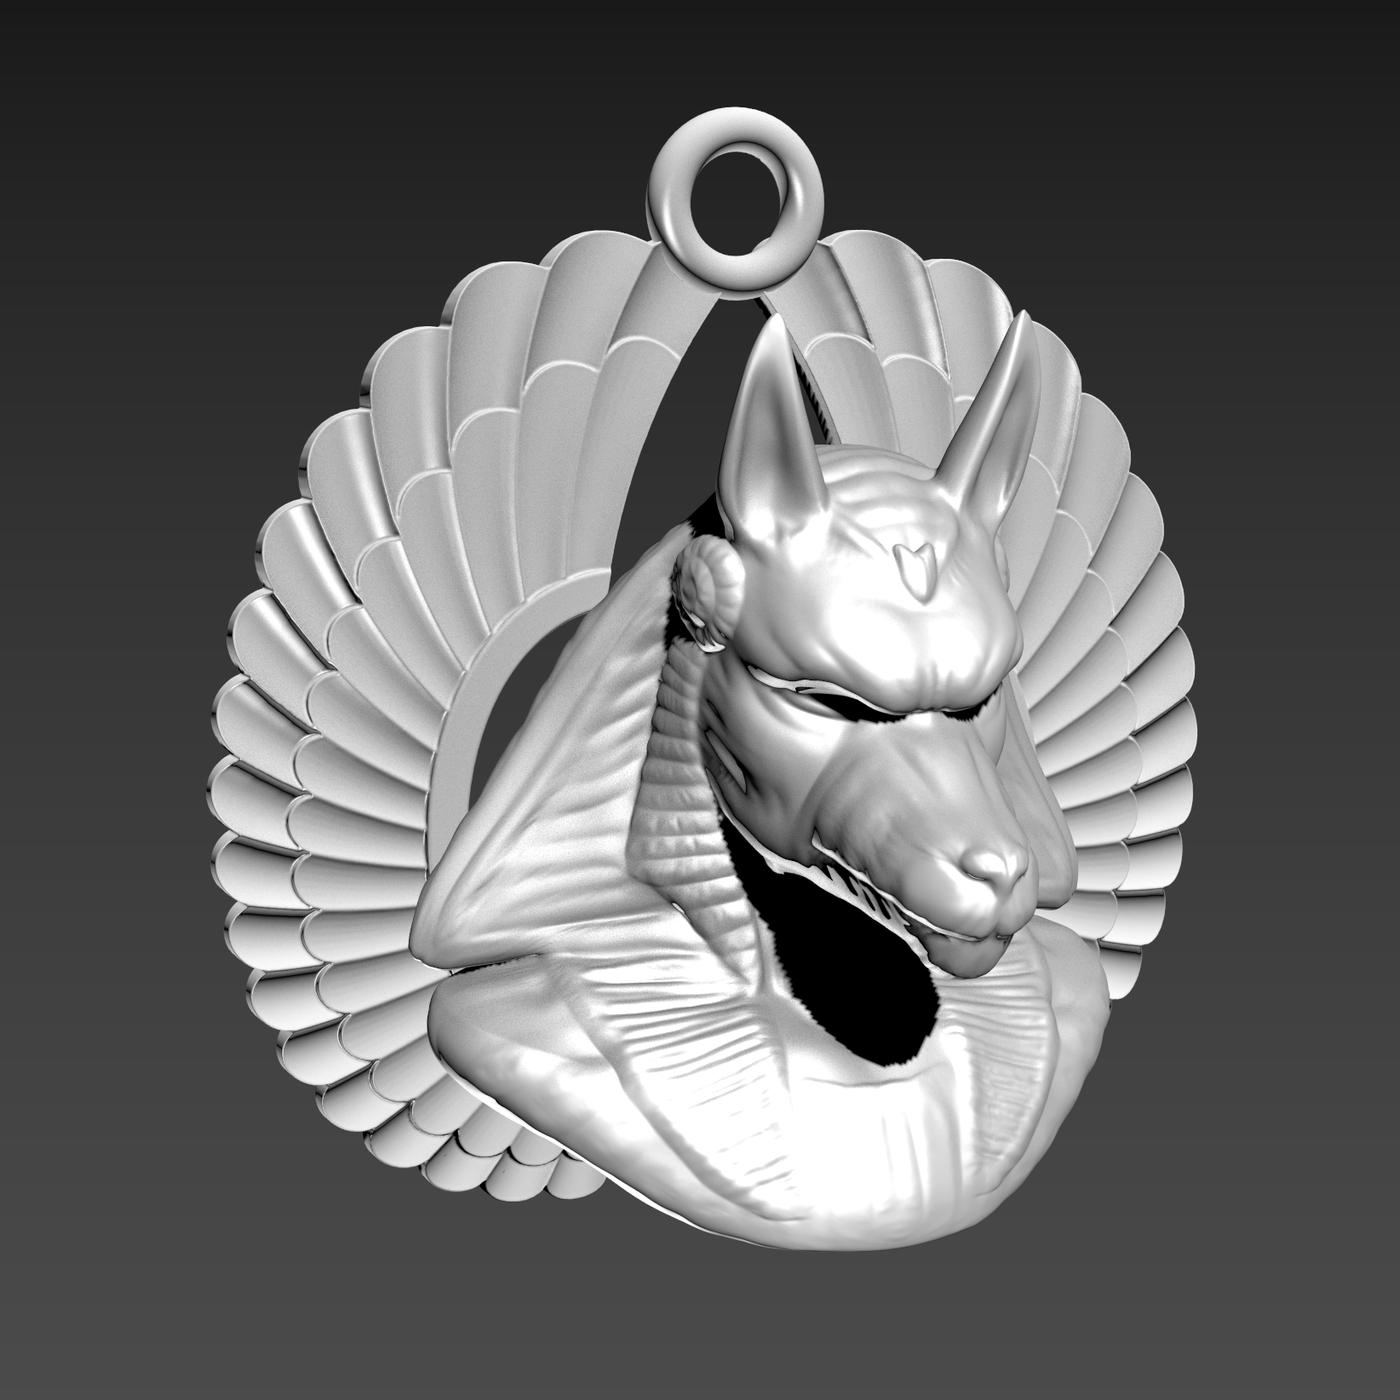 Anubis bust wing Sculpture Egyptian symbol pendant jewelry 3D print model